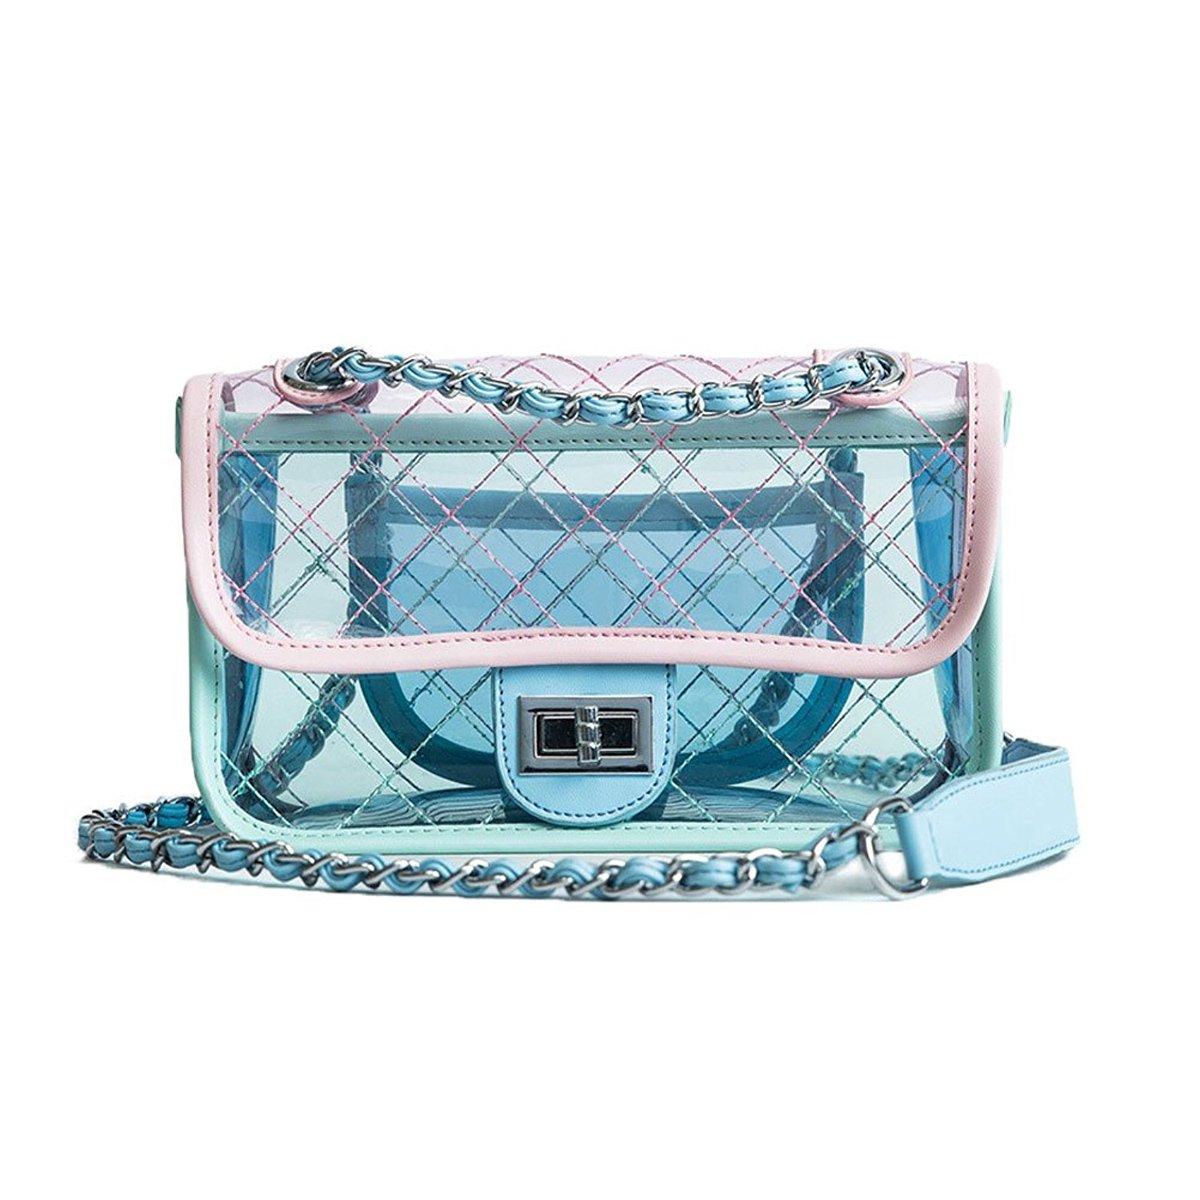 3aec749bd3ee YOOXI Womens' Clear Purse Turn Lock Handbags Chain Shoulder Bags NFL ...